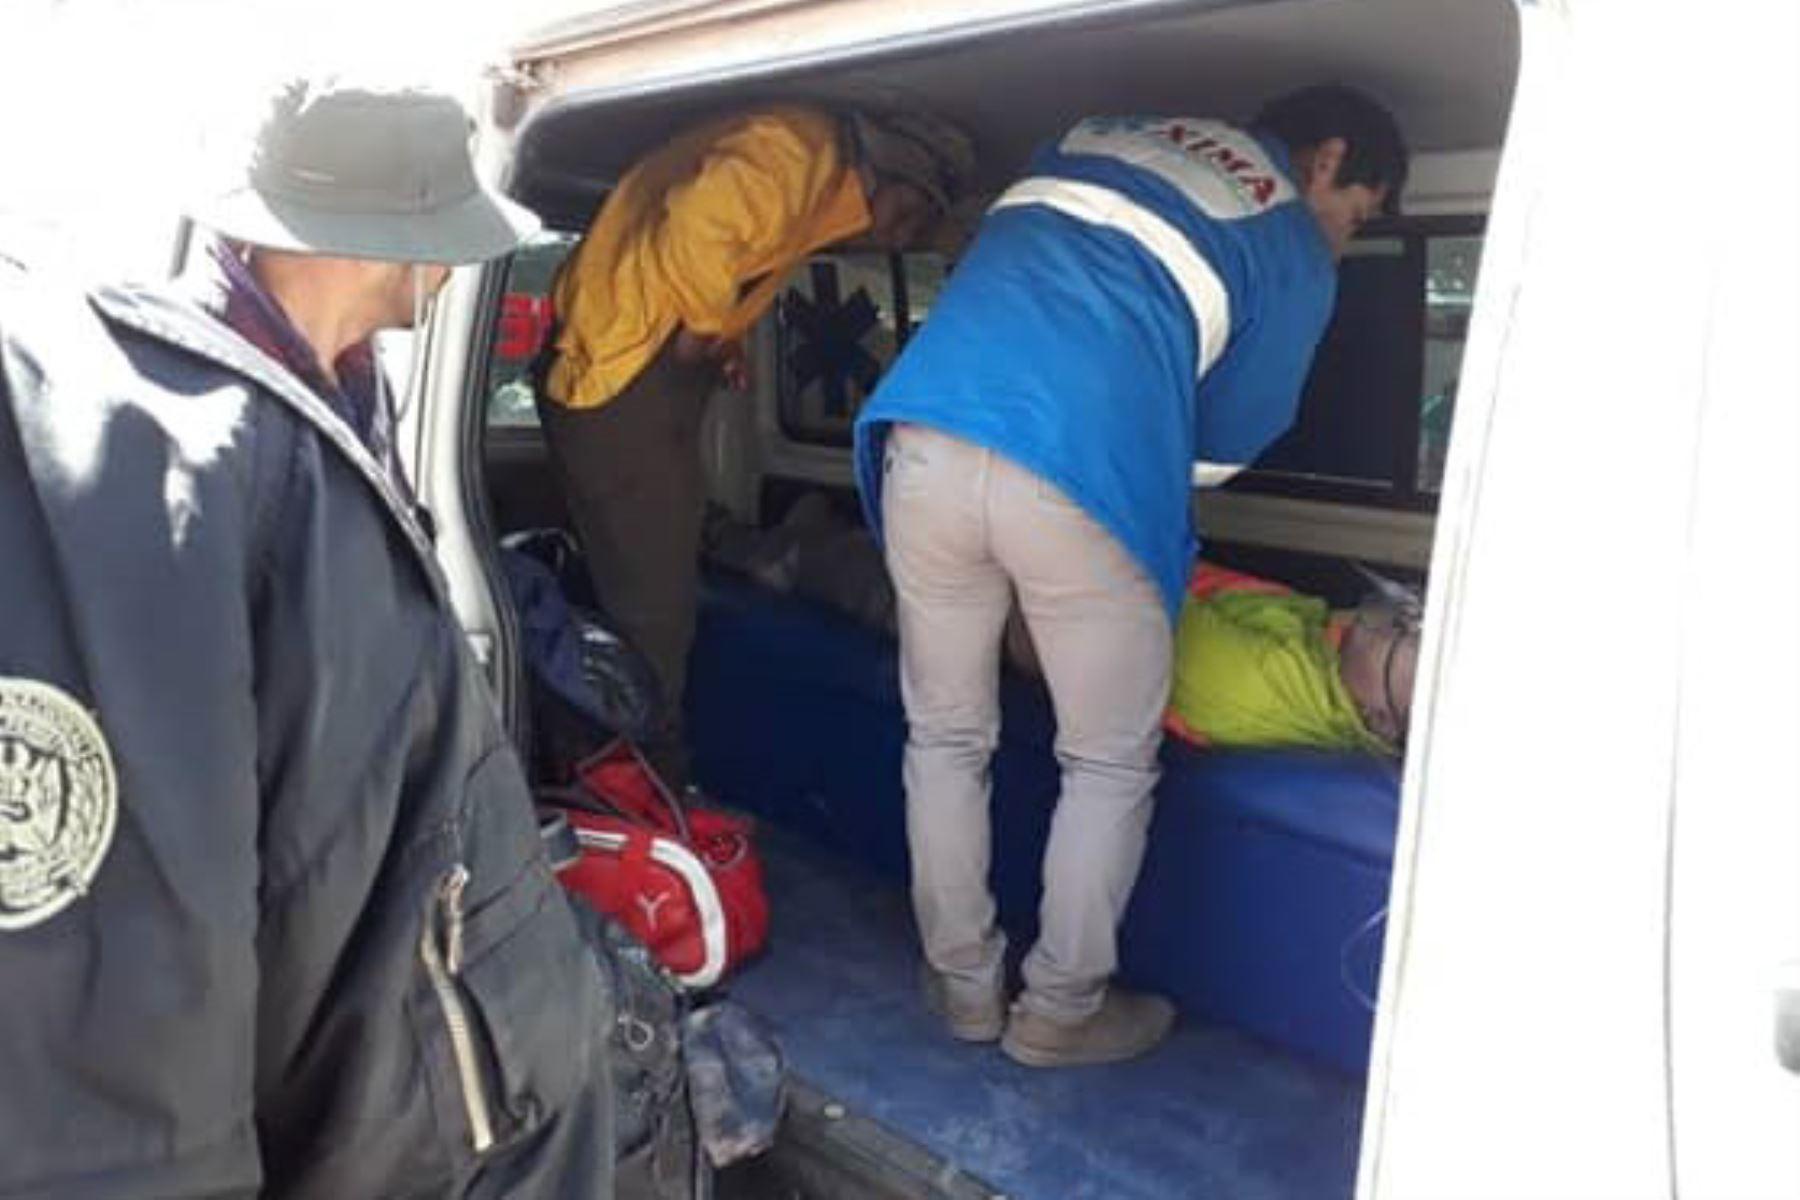 Turista coreano-estadounidense fallece al llegar a cumbre del Winikunka o montaña de 7 colores, en Cusco. ANDINA